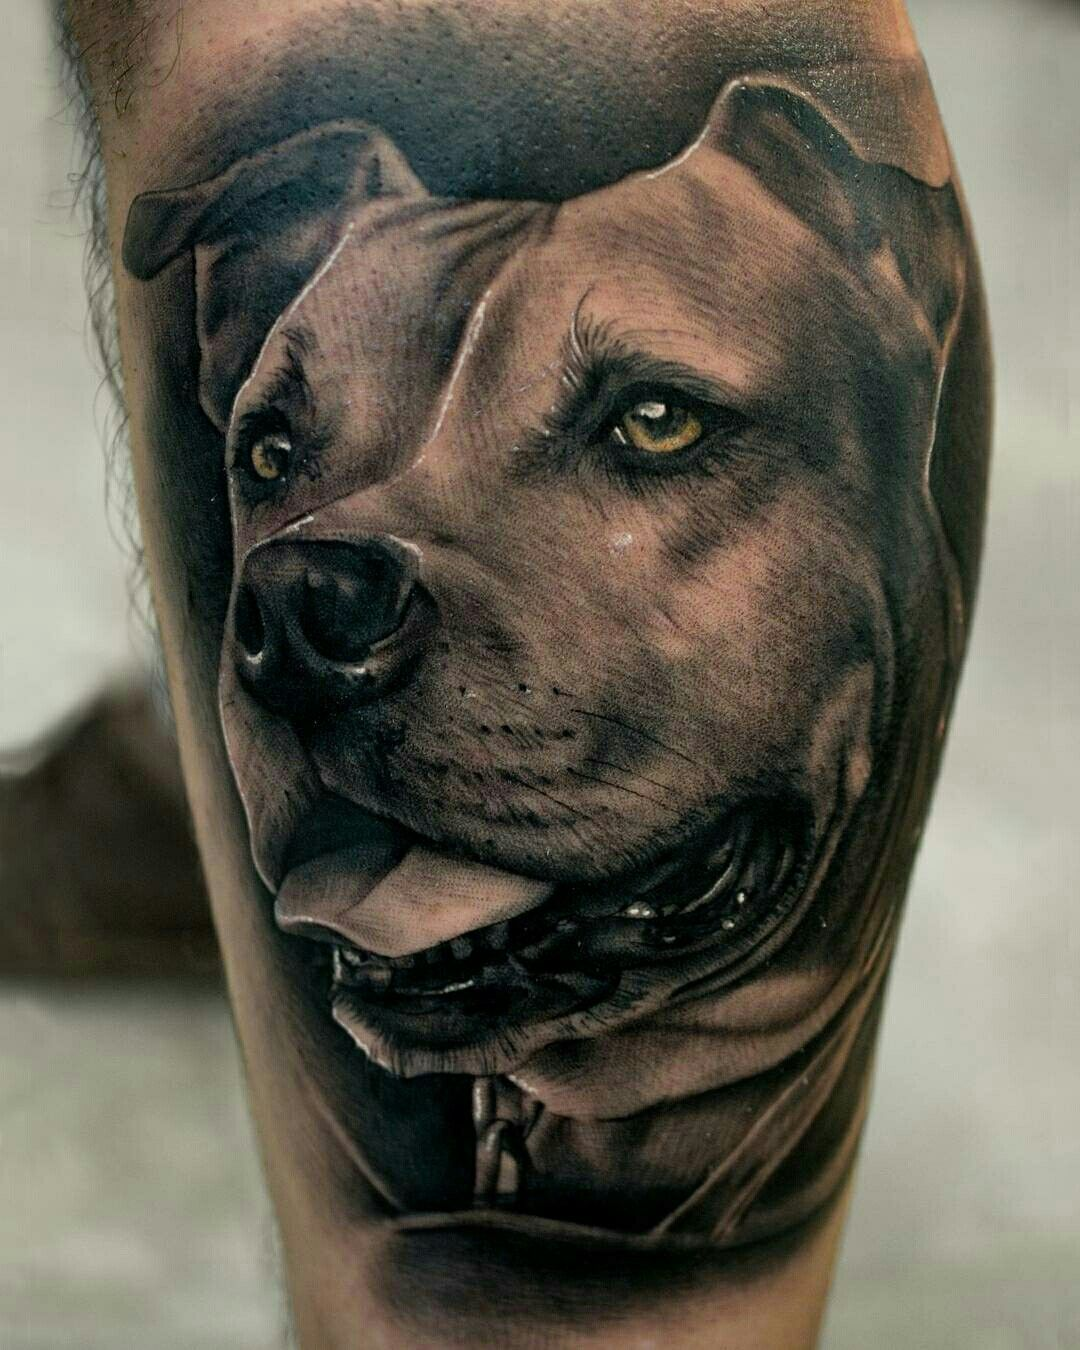 Tattoo Done By Pablo Hernandez Bambamsi Com Pitbull Amstaff